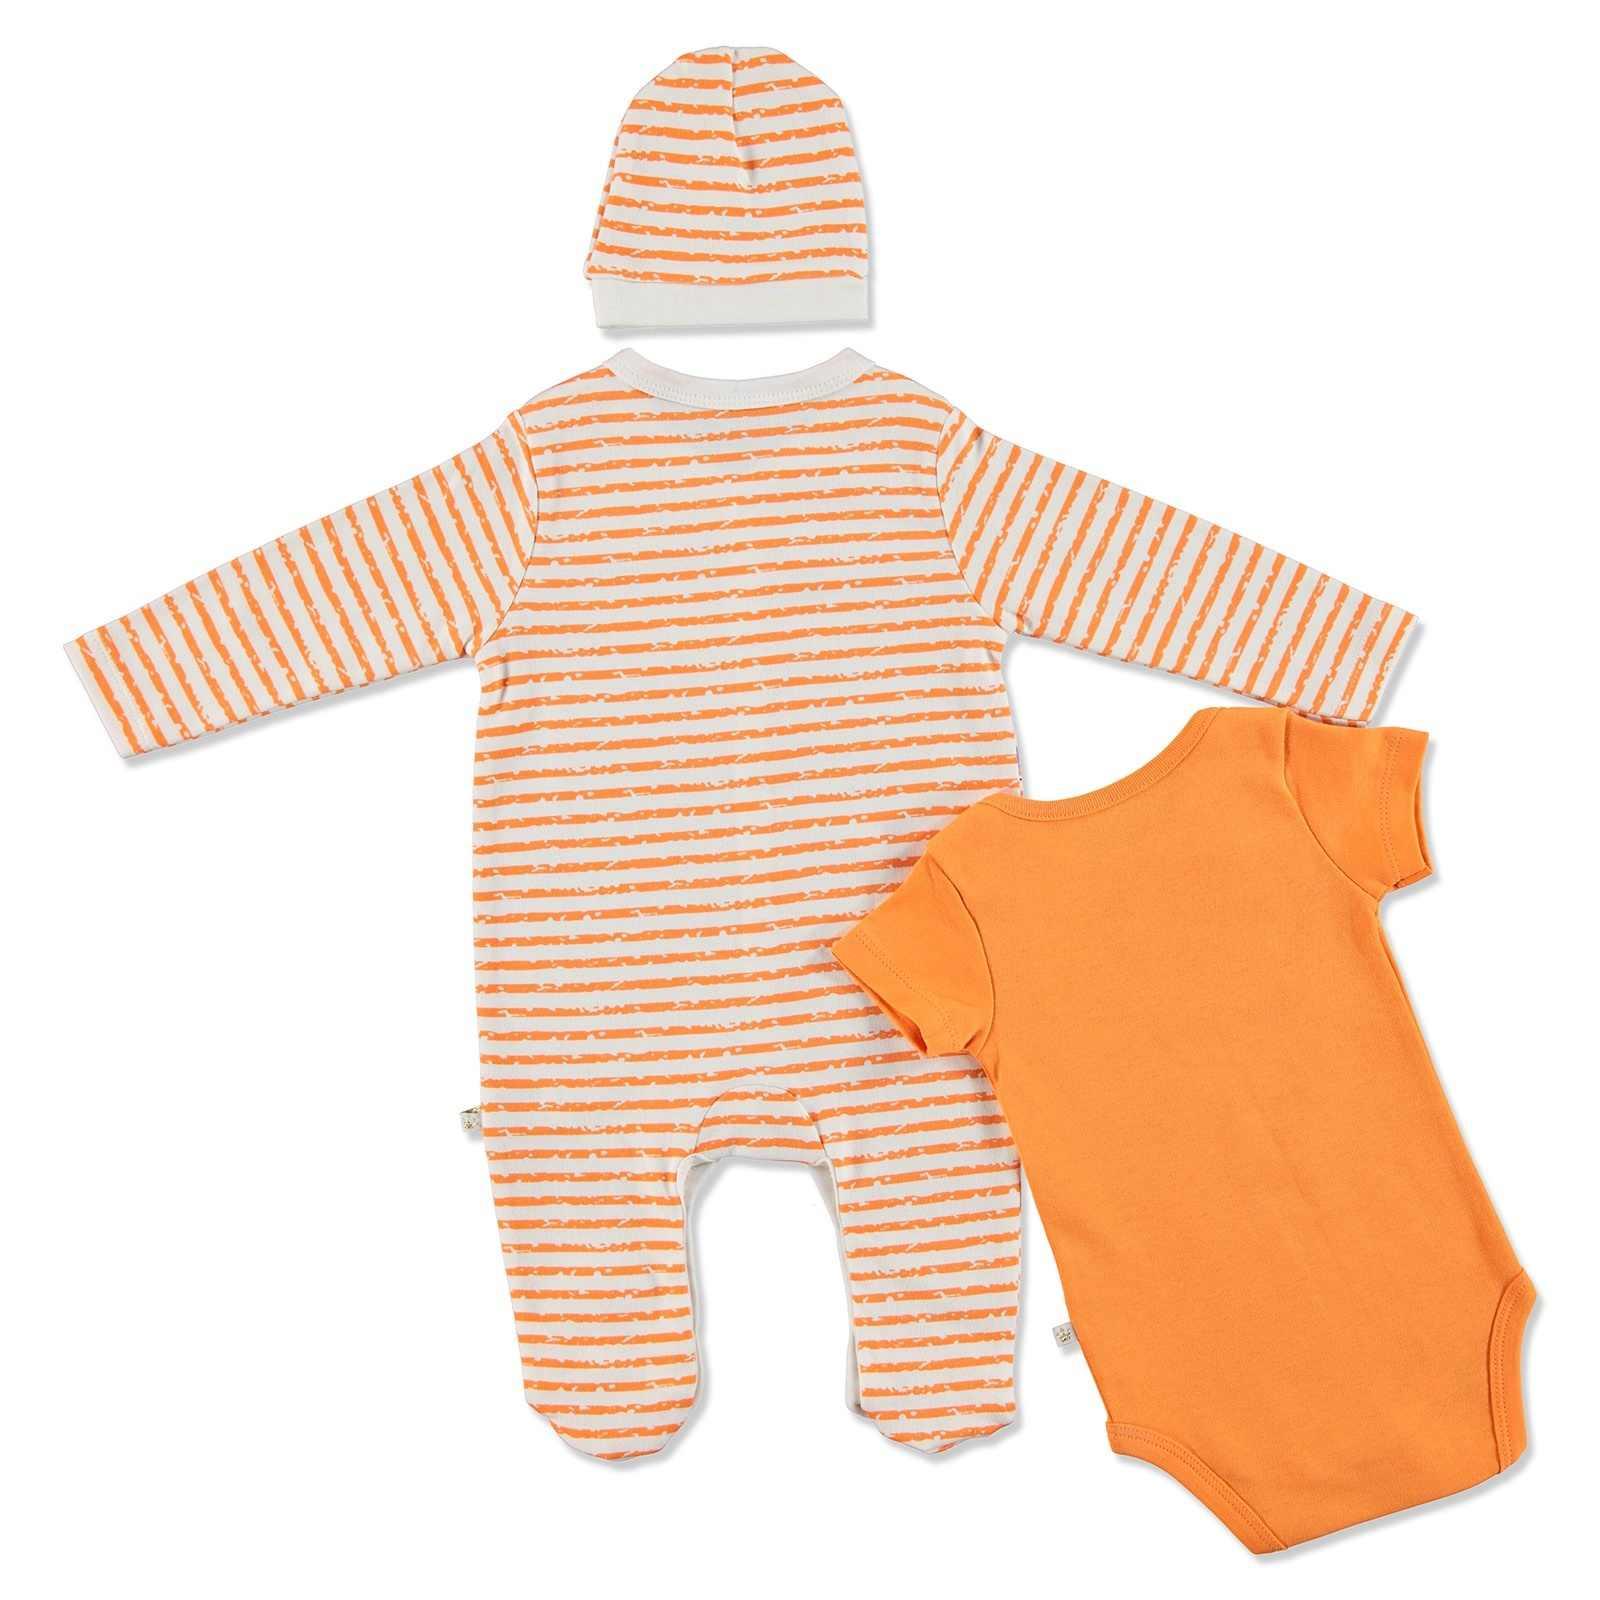 ebebek For My Baby Summer Boy Dino Romper Bodysuit Hat 3 pcs Set